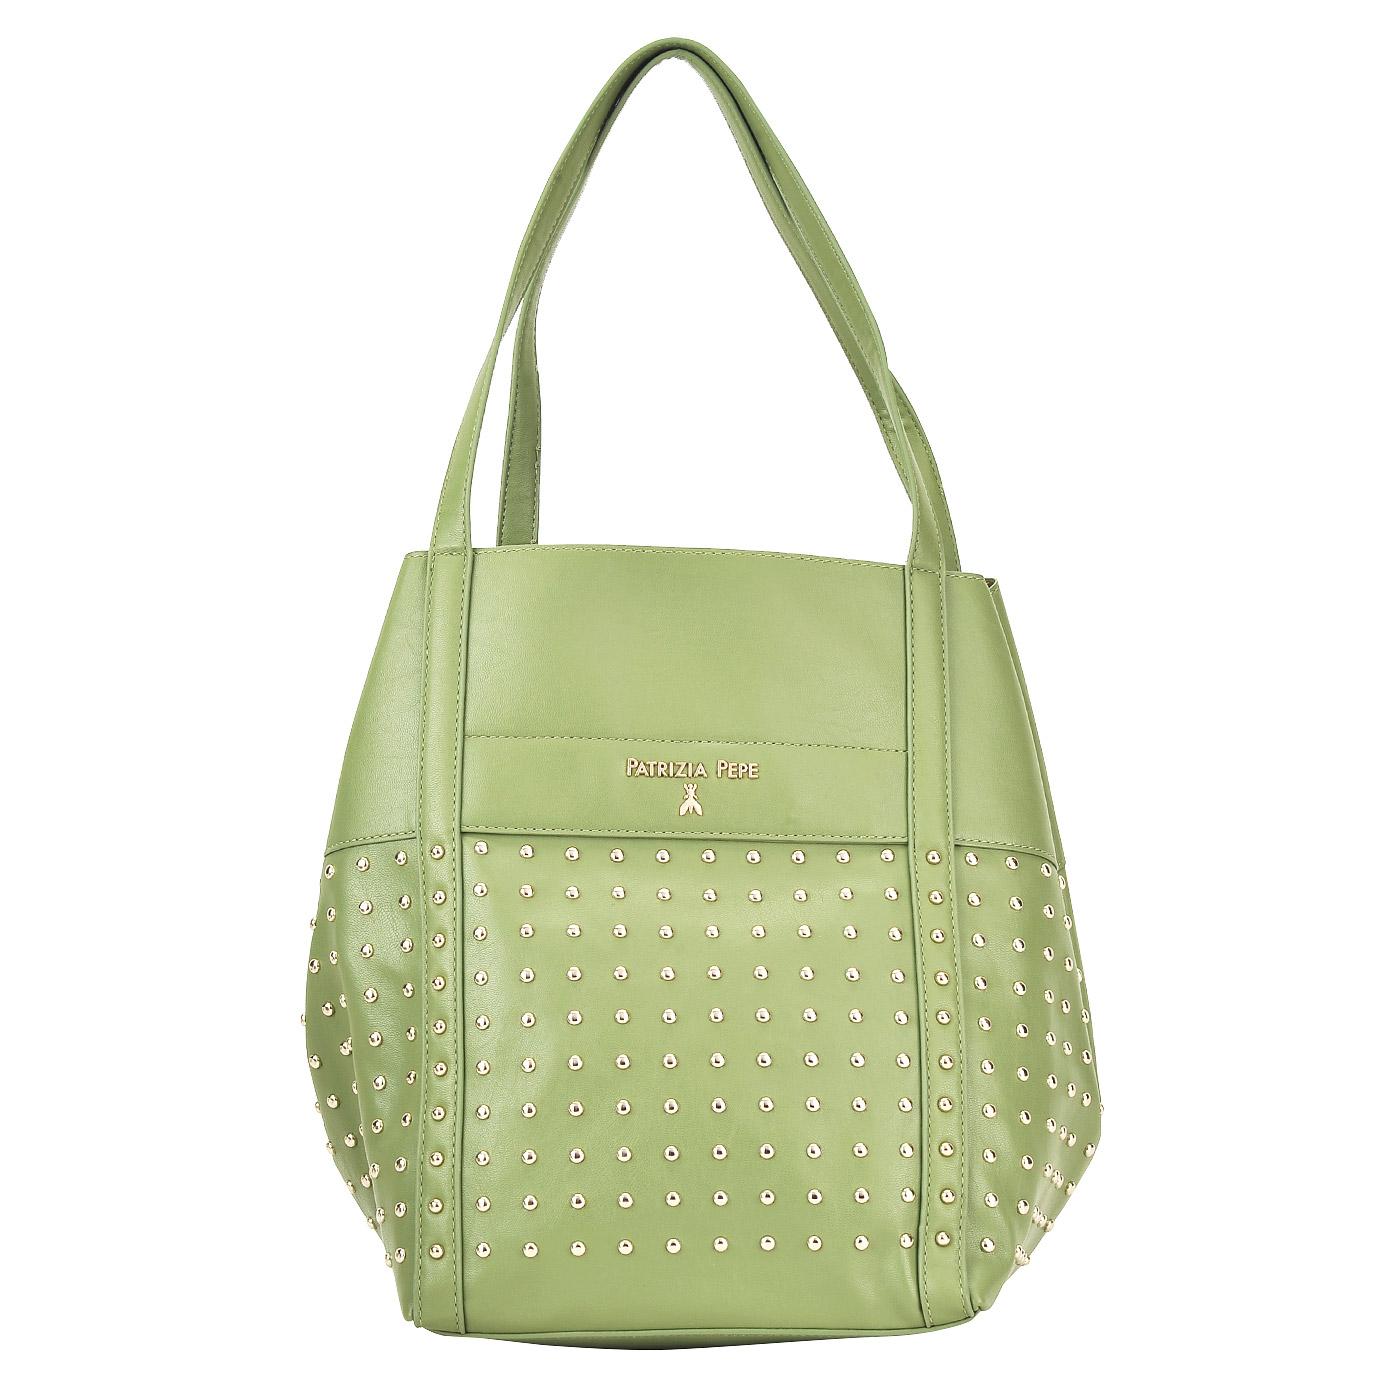 СумкаКлассические сумки<br>Закрывается хлястиками на кнопку. Внутри съемная сумка на молнии, в которой карман на молнии и два открытых кармана.<br><br>count_sale: 0<br>new: 1<br>sale: 0